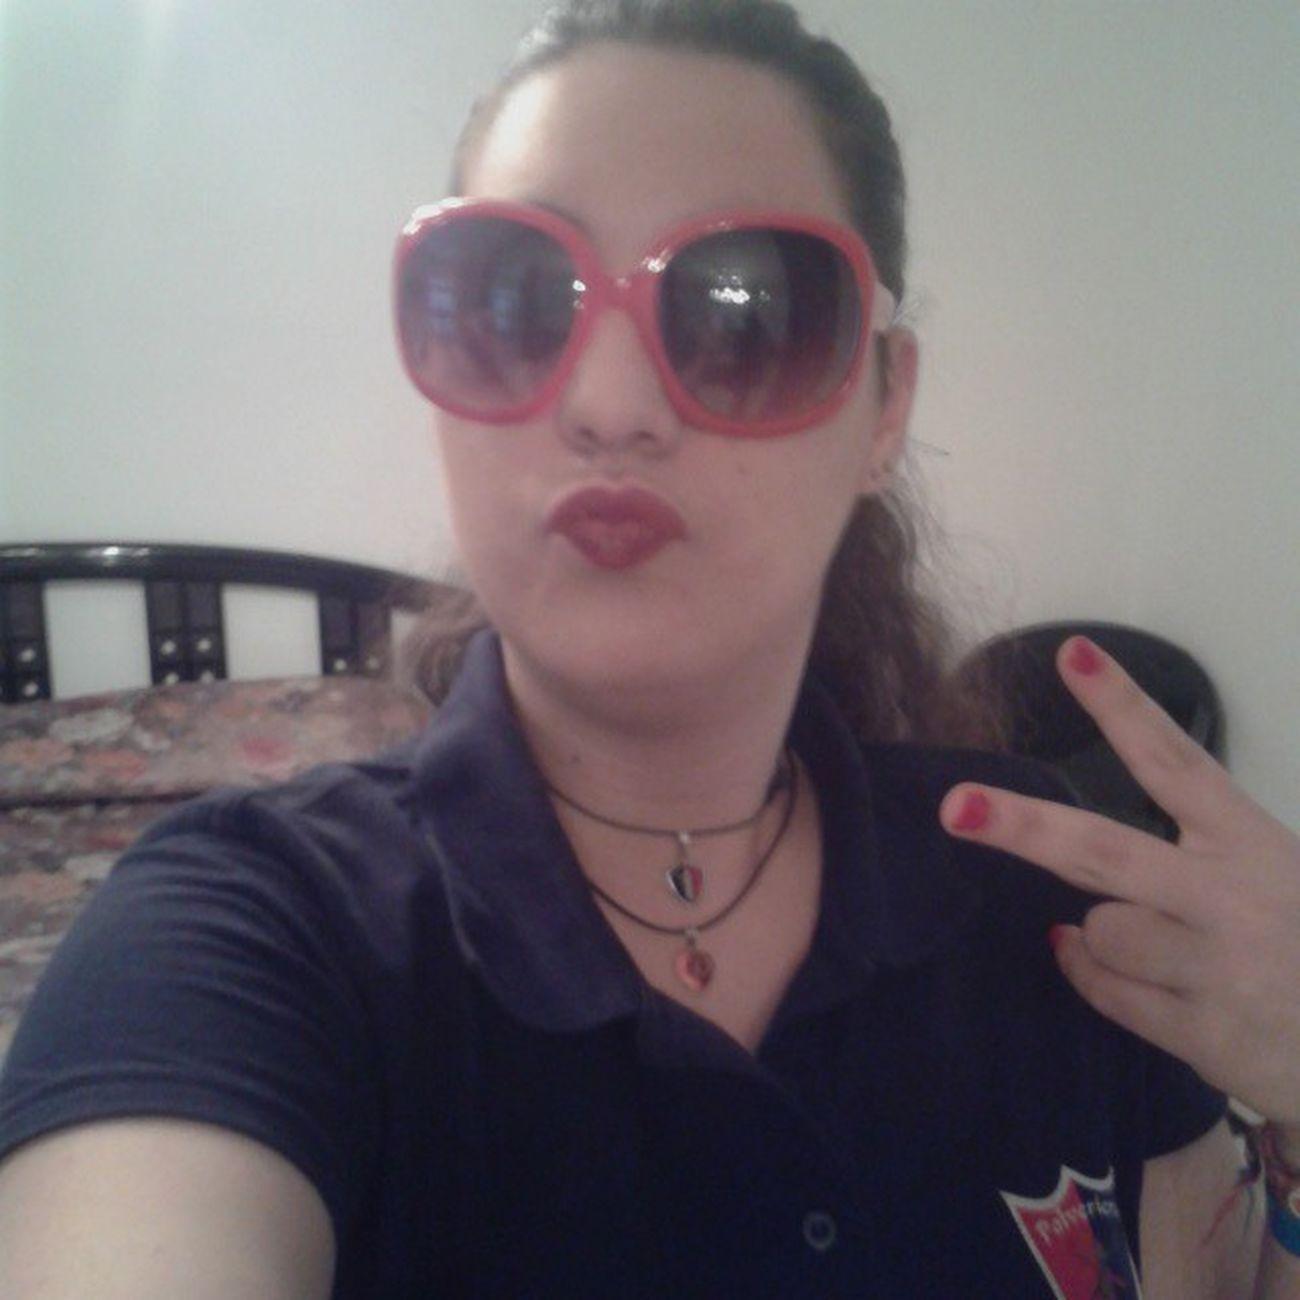 Namese a pia sto Palietto Me Selfie Vamos Palietto Rossoblumipiacitu Polveriera Daje Red Blue